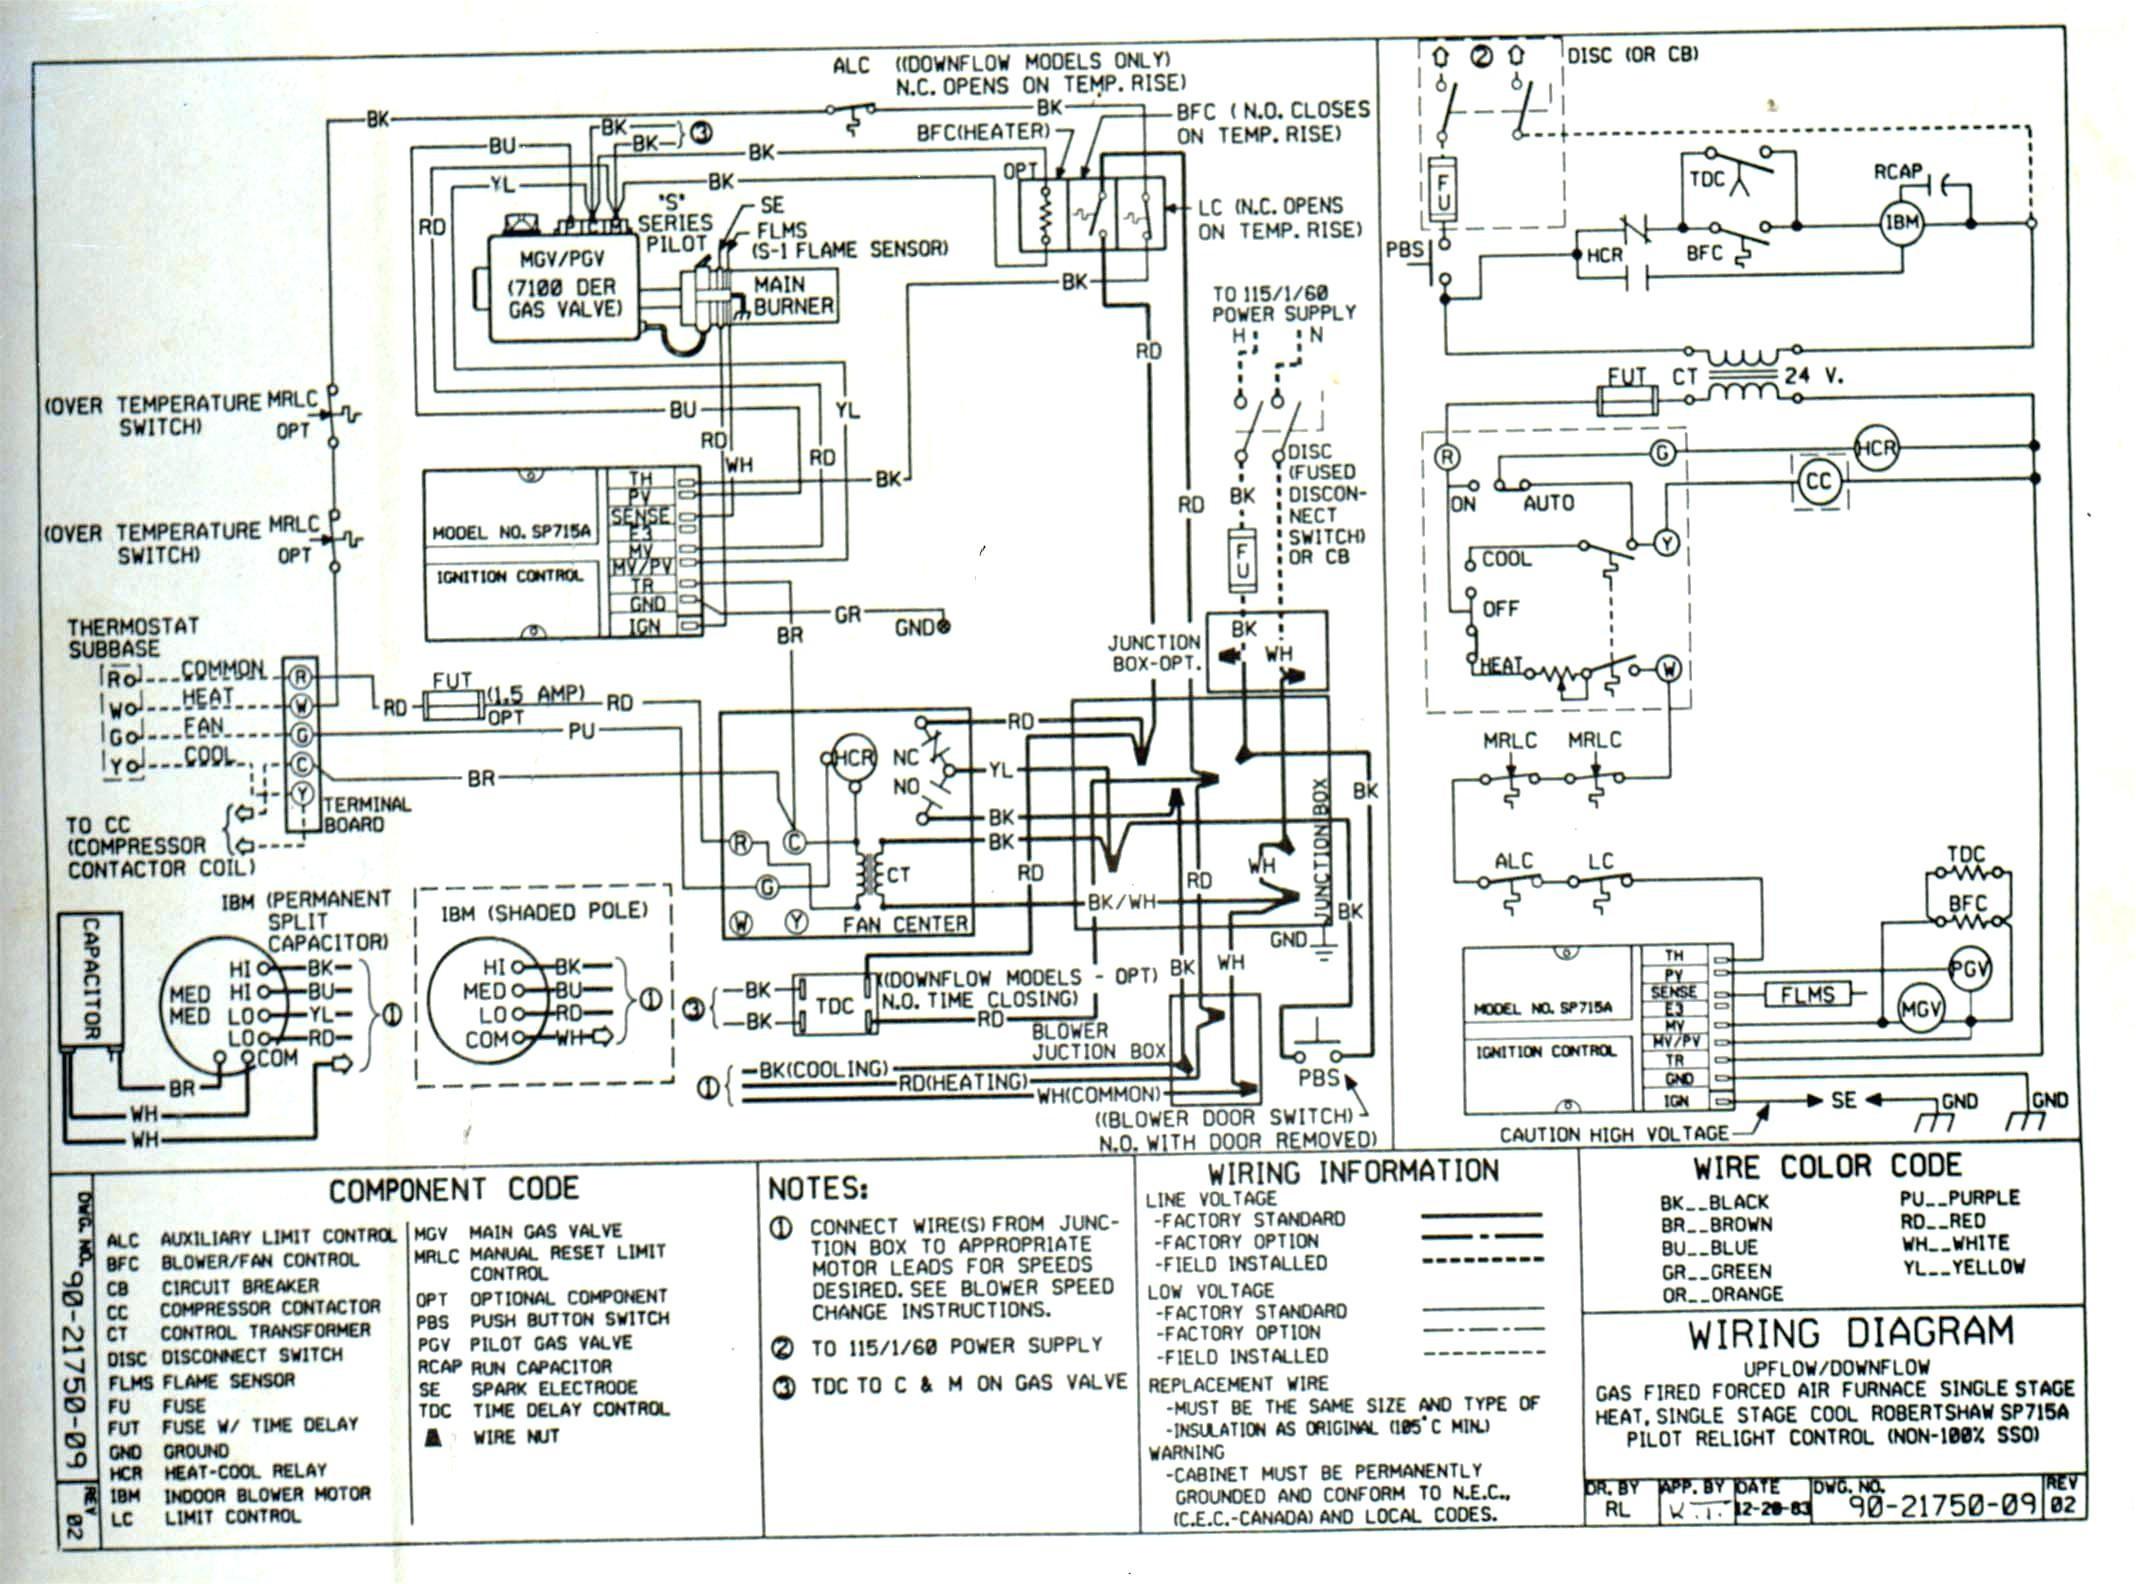 Trane Xl 1200 Heat Pump Wiring Diagrams - Ktm 300 Xc W Wiring Diagram -  fisher-wire.2010menanti.jeanjaures37.fr | Hvac Wiring Diagram For Trane 1200 Xl |  | Wiring Diagram Resource